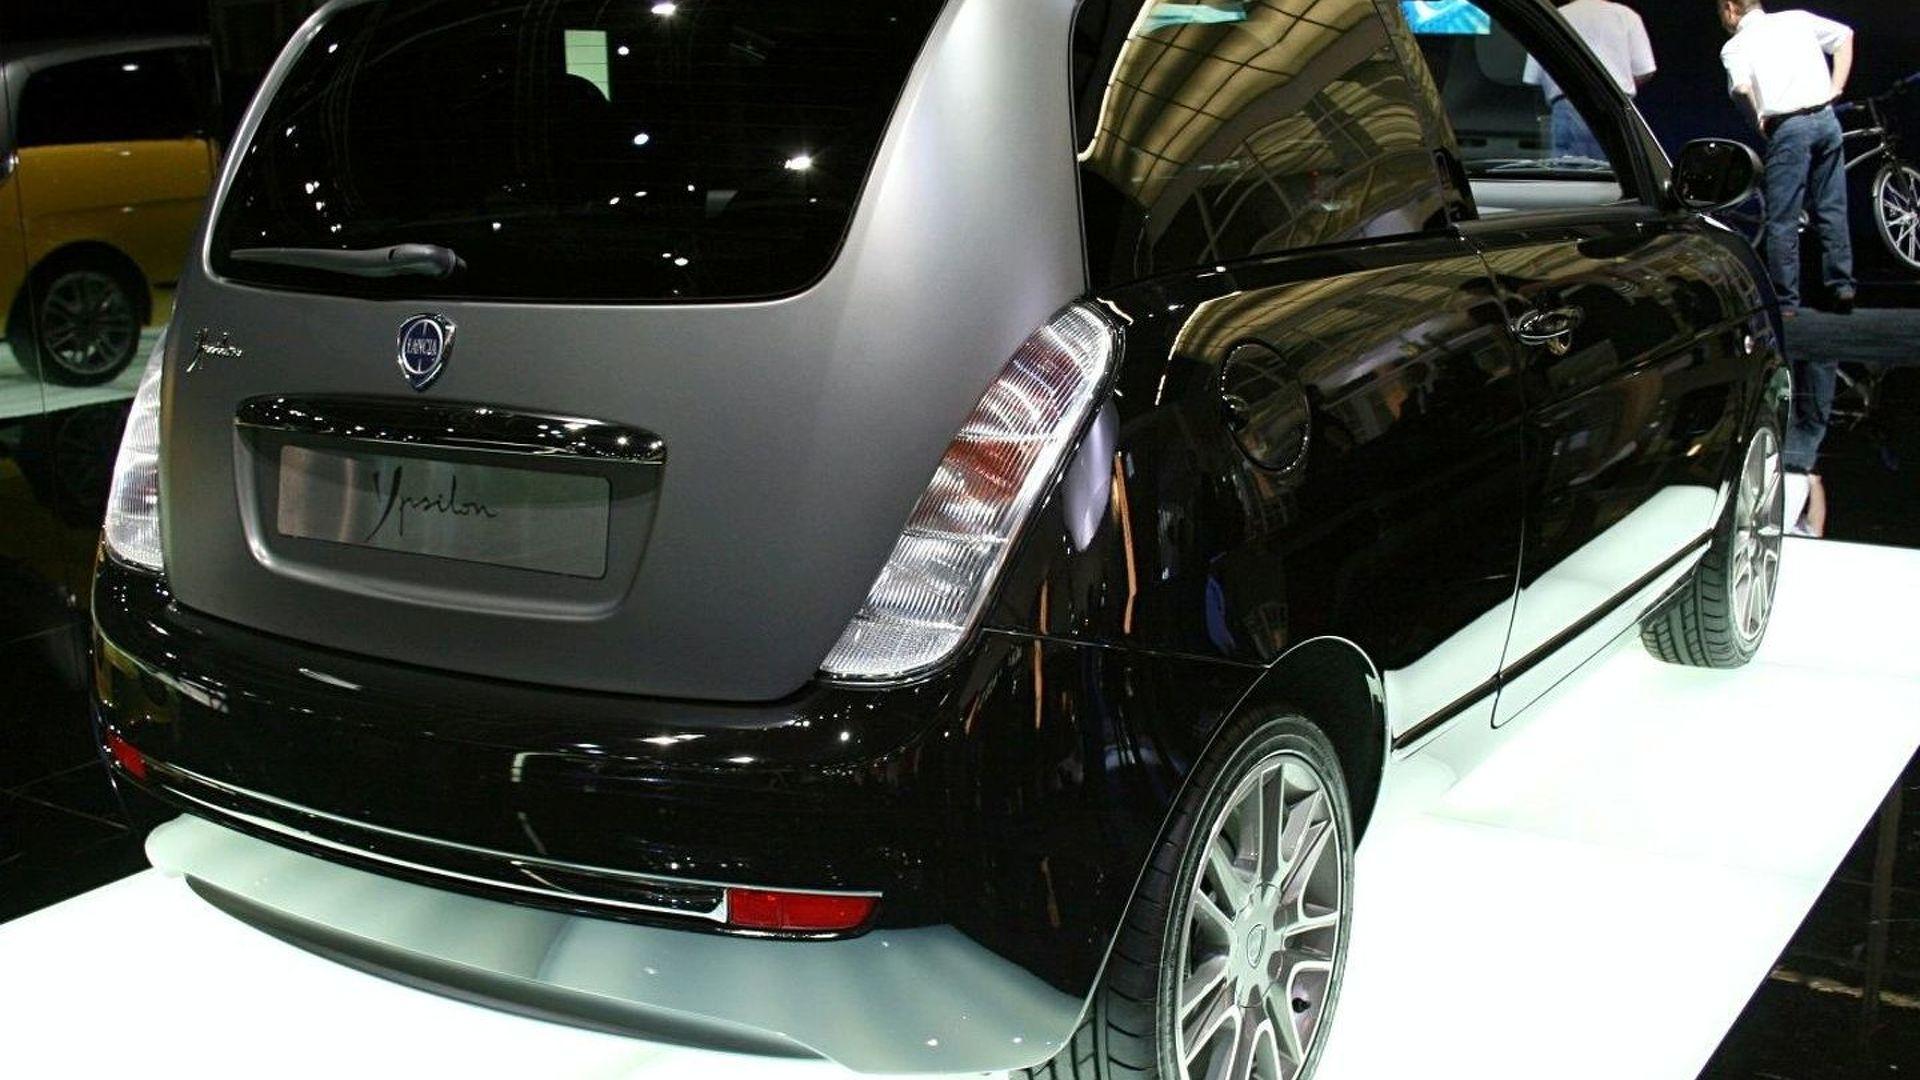 https://icdn-7.motor1.com/images/mgl/N3Yy/s1/2007-31225-exclusive-new-lancia-ypsilon-sport-momodesign1.jpg